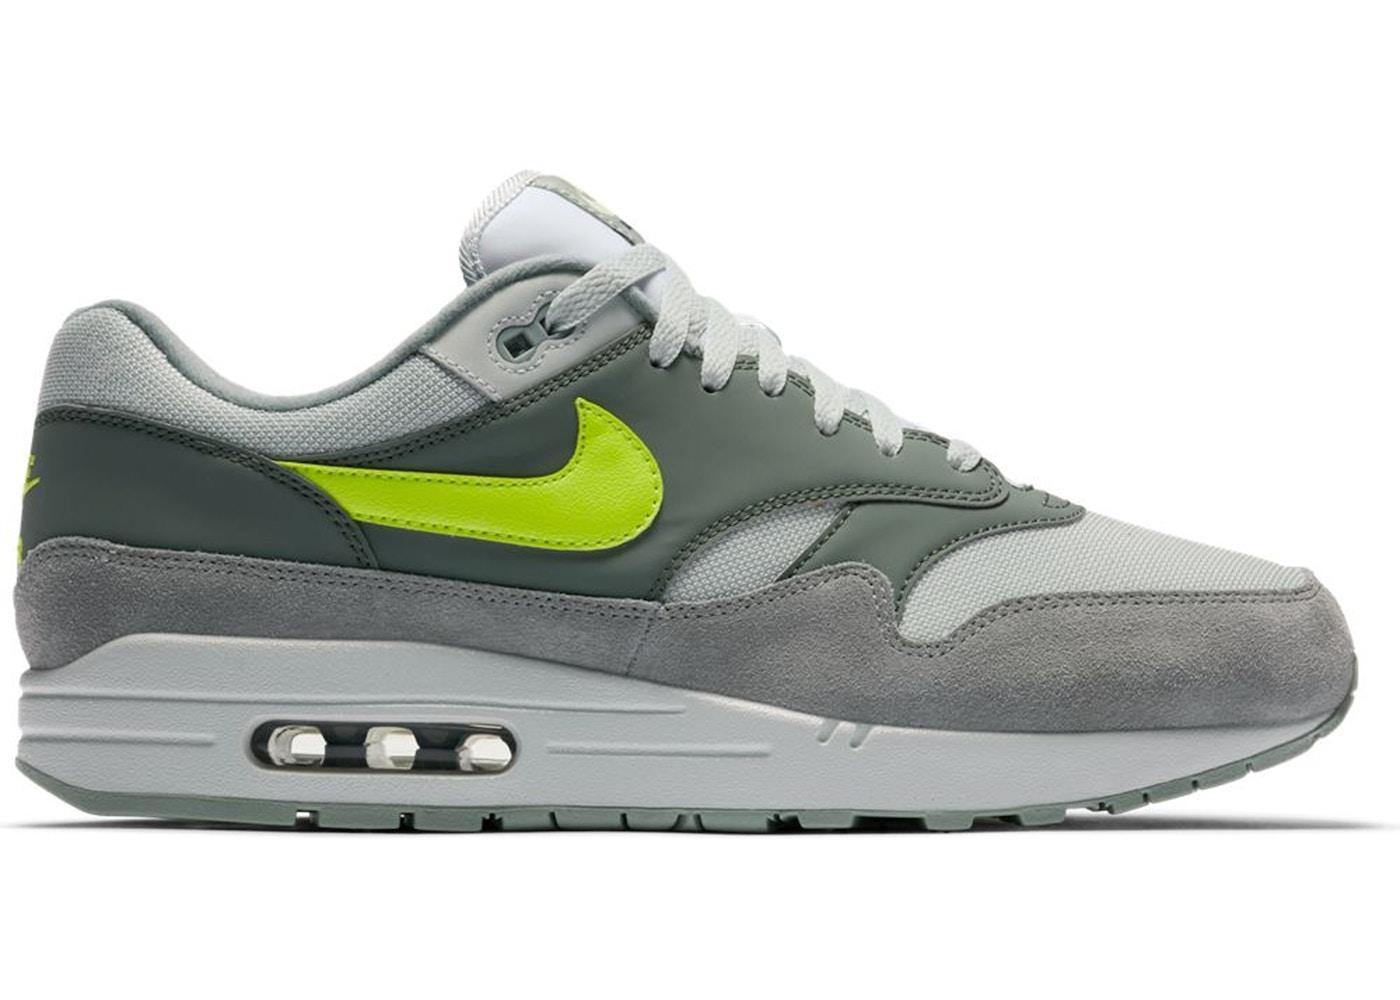 separation shoes 8496c 3ee31 Air Max 1 Mica Green Volt